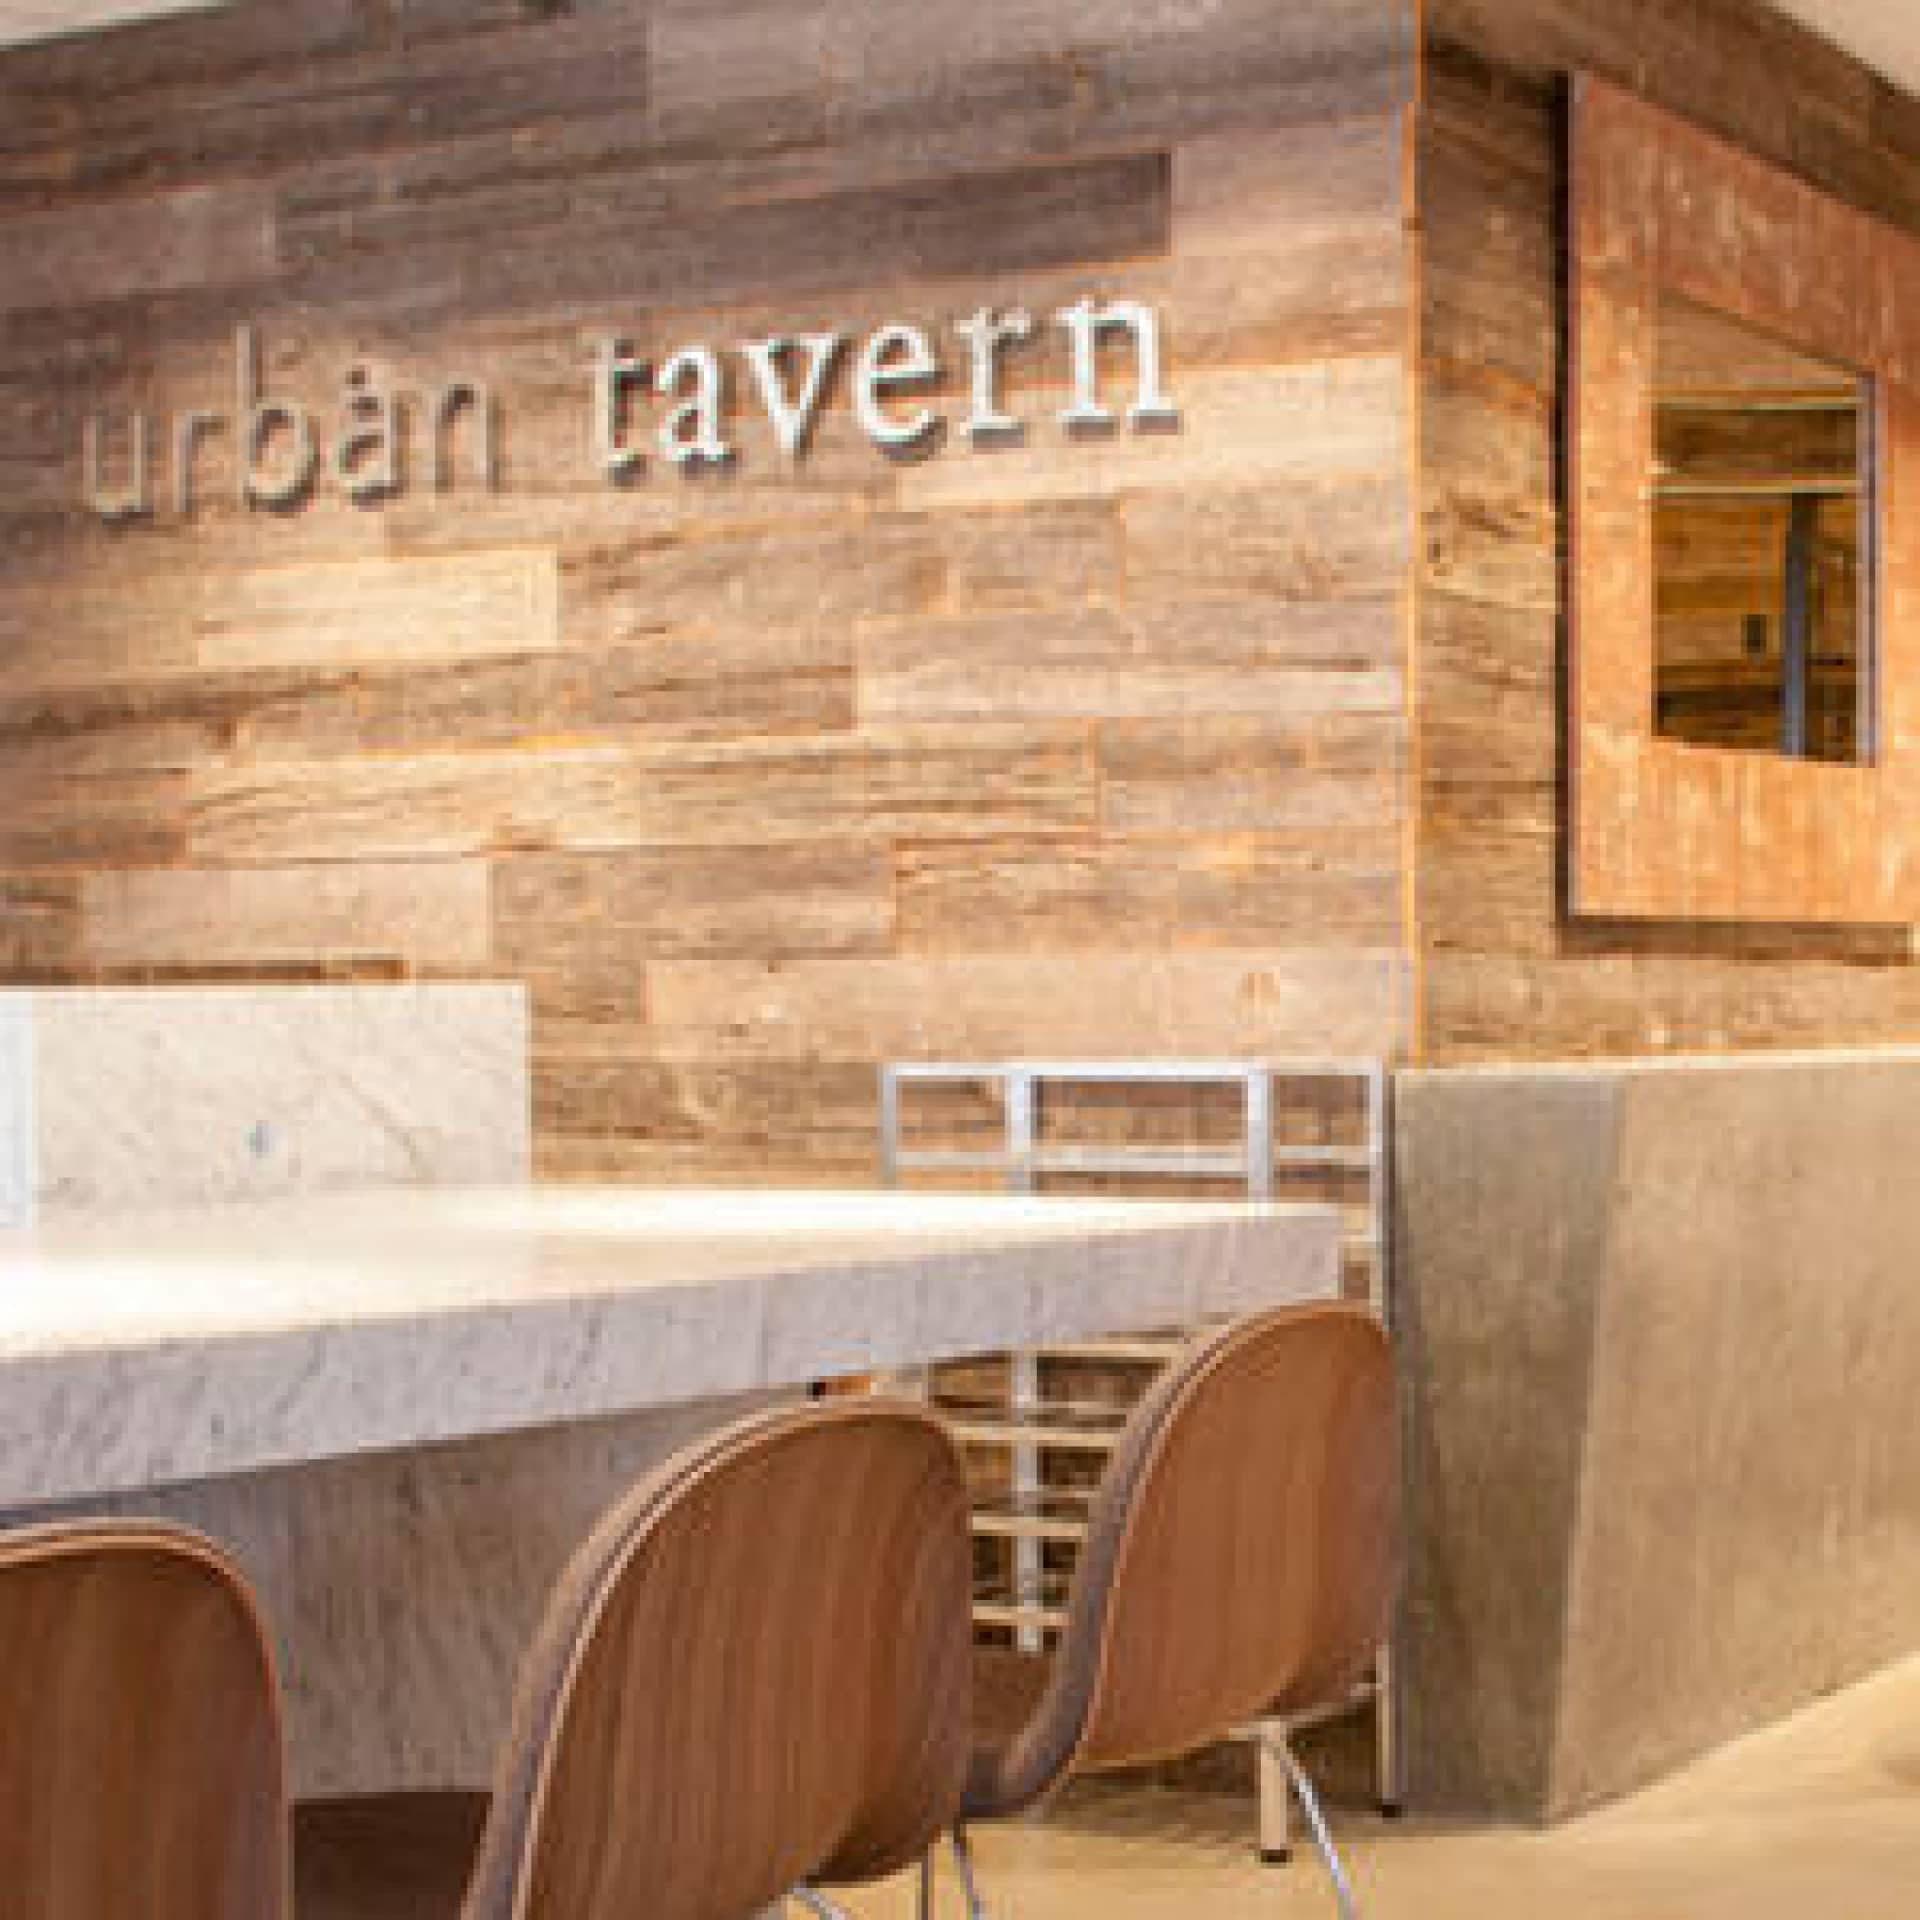 urban-tavern